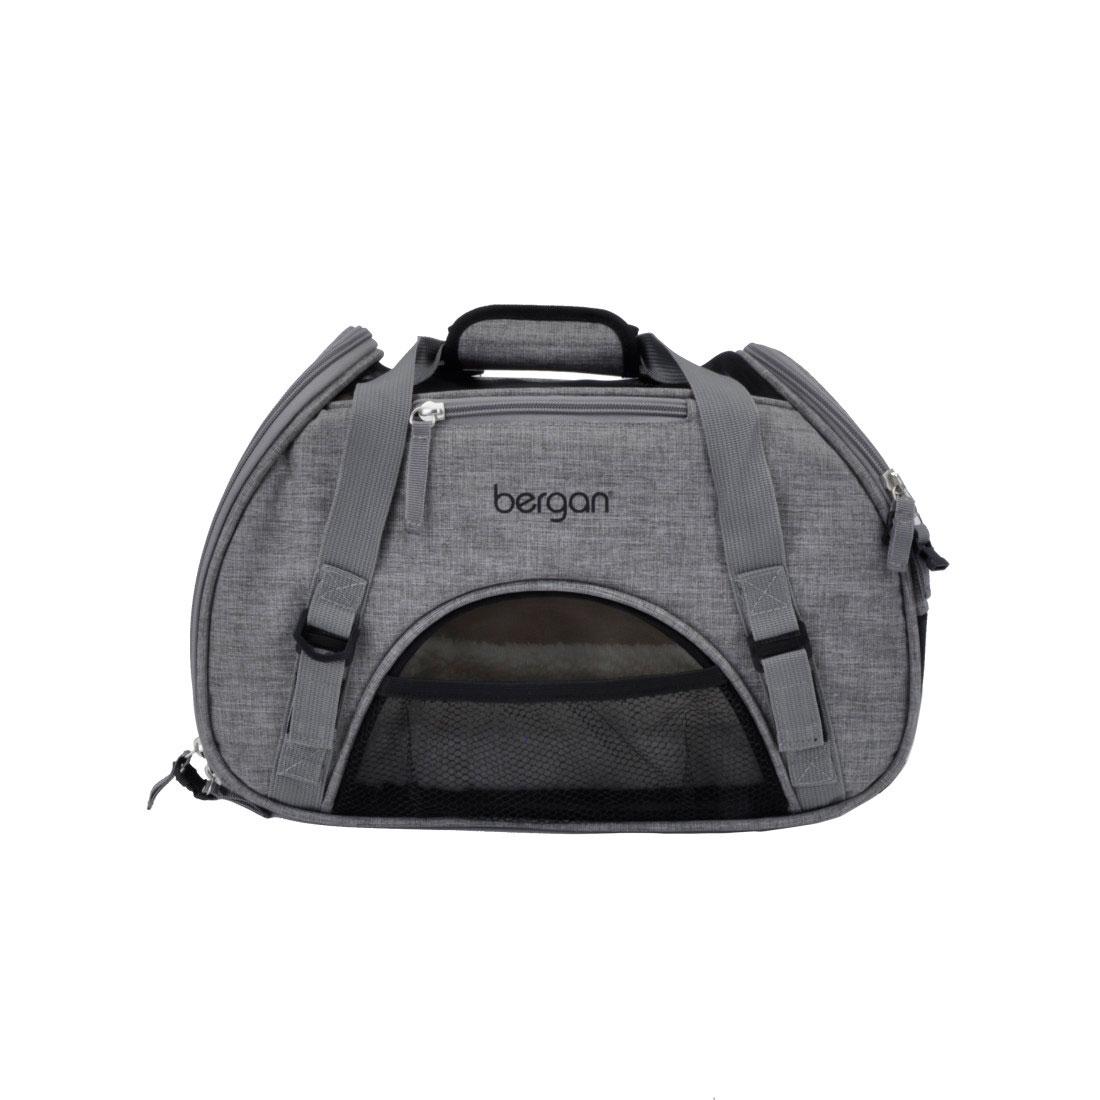 Bergan Comfort Pet Carrier, Heather Grey Image